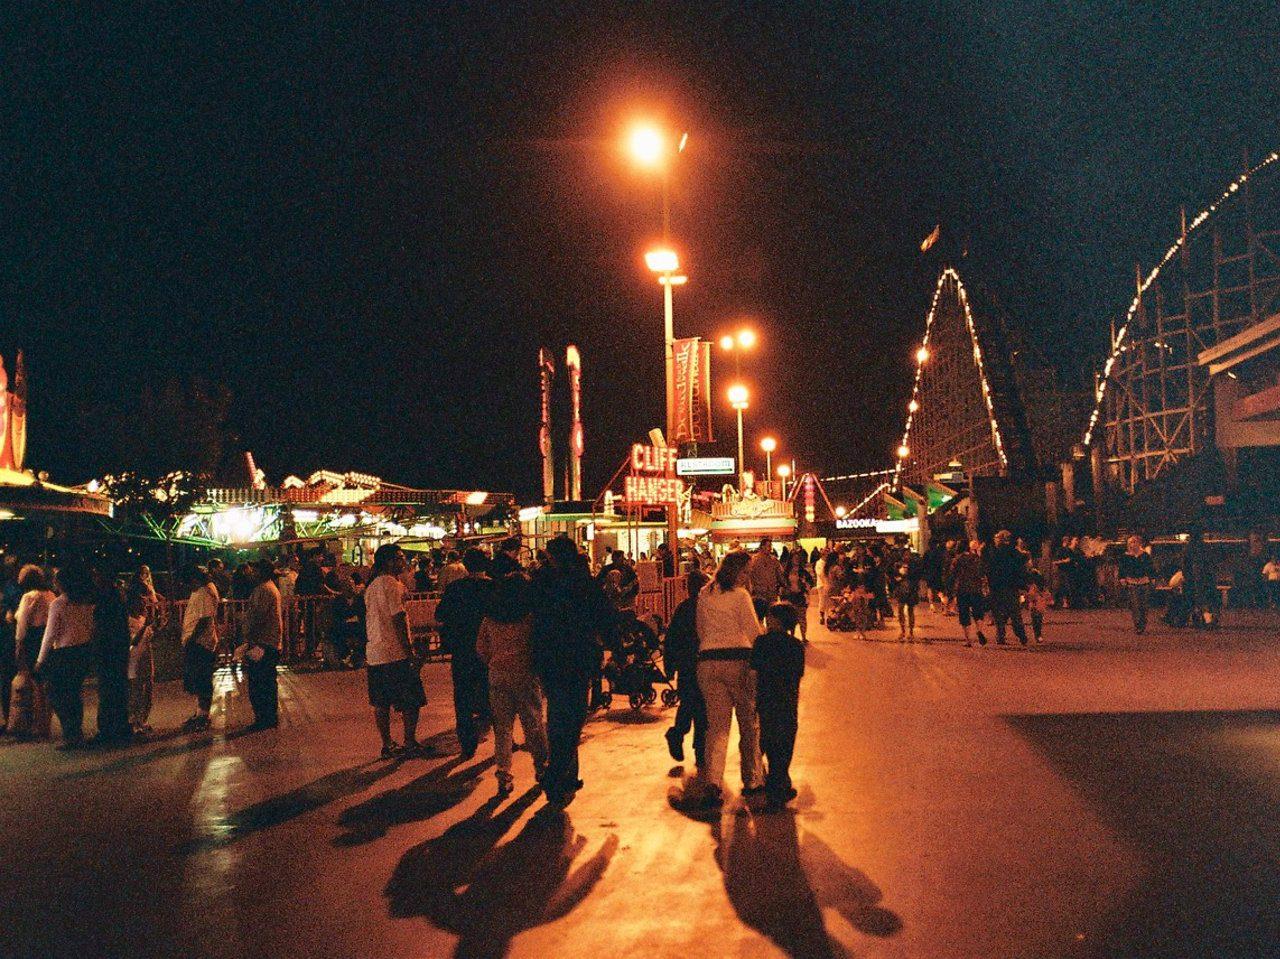 Abends auf dem Santa Cruz Beach Boardwalk. (Bild: André Eymann)